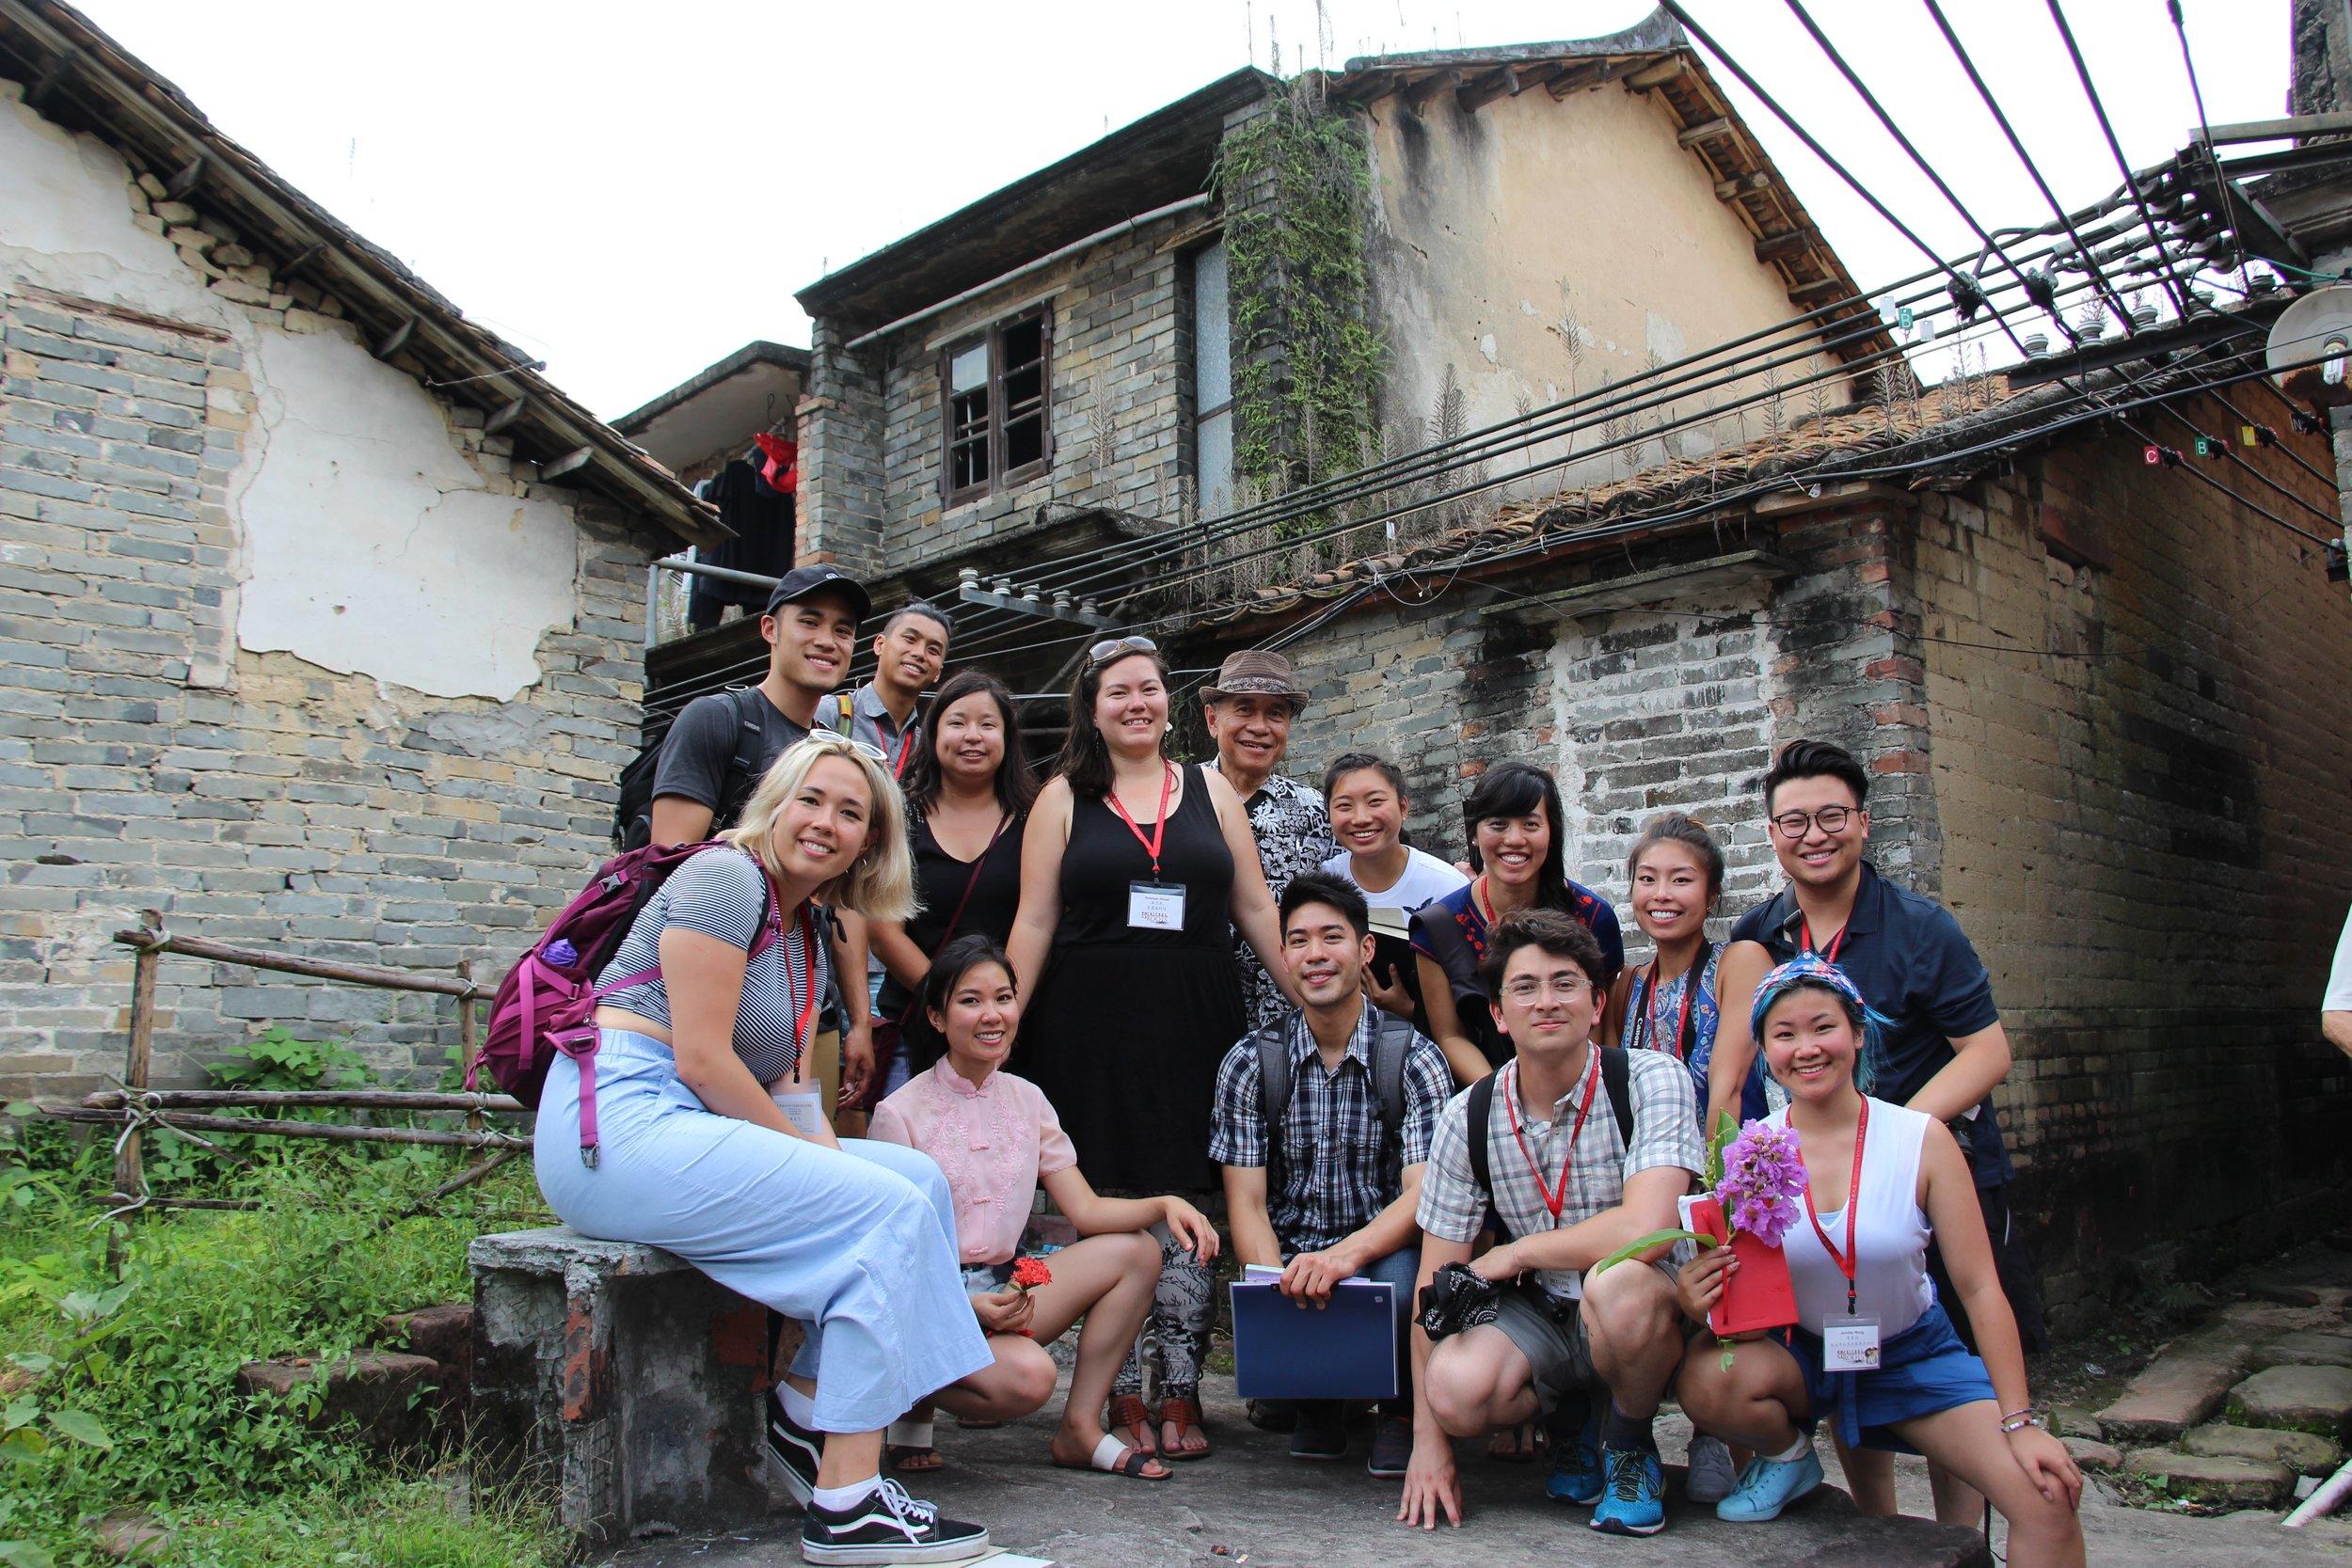 The 2017 cohort in Bekah Olstad's maternal grandfather's village in Dongguan